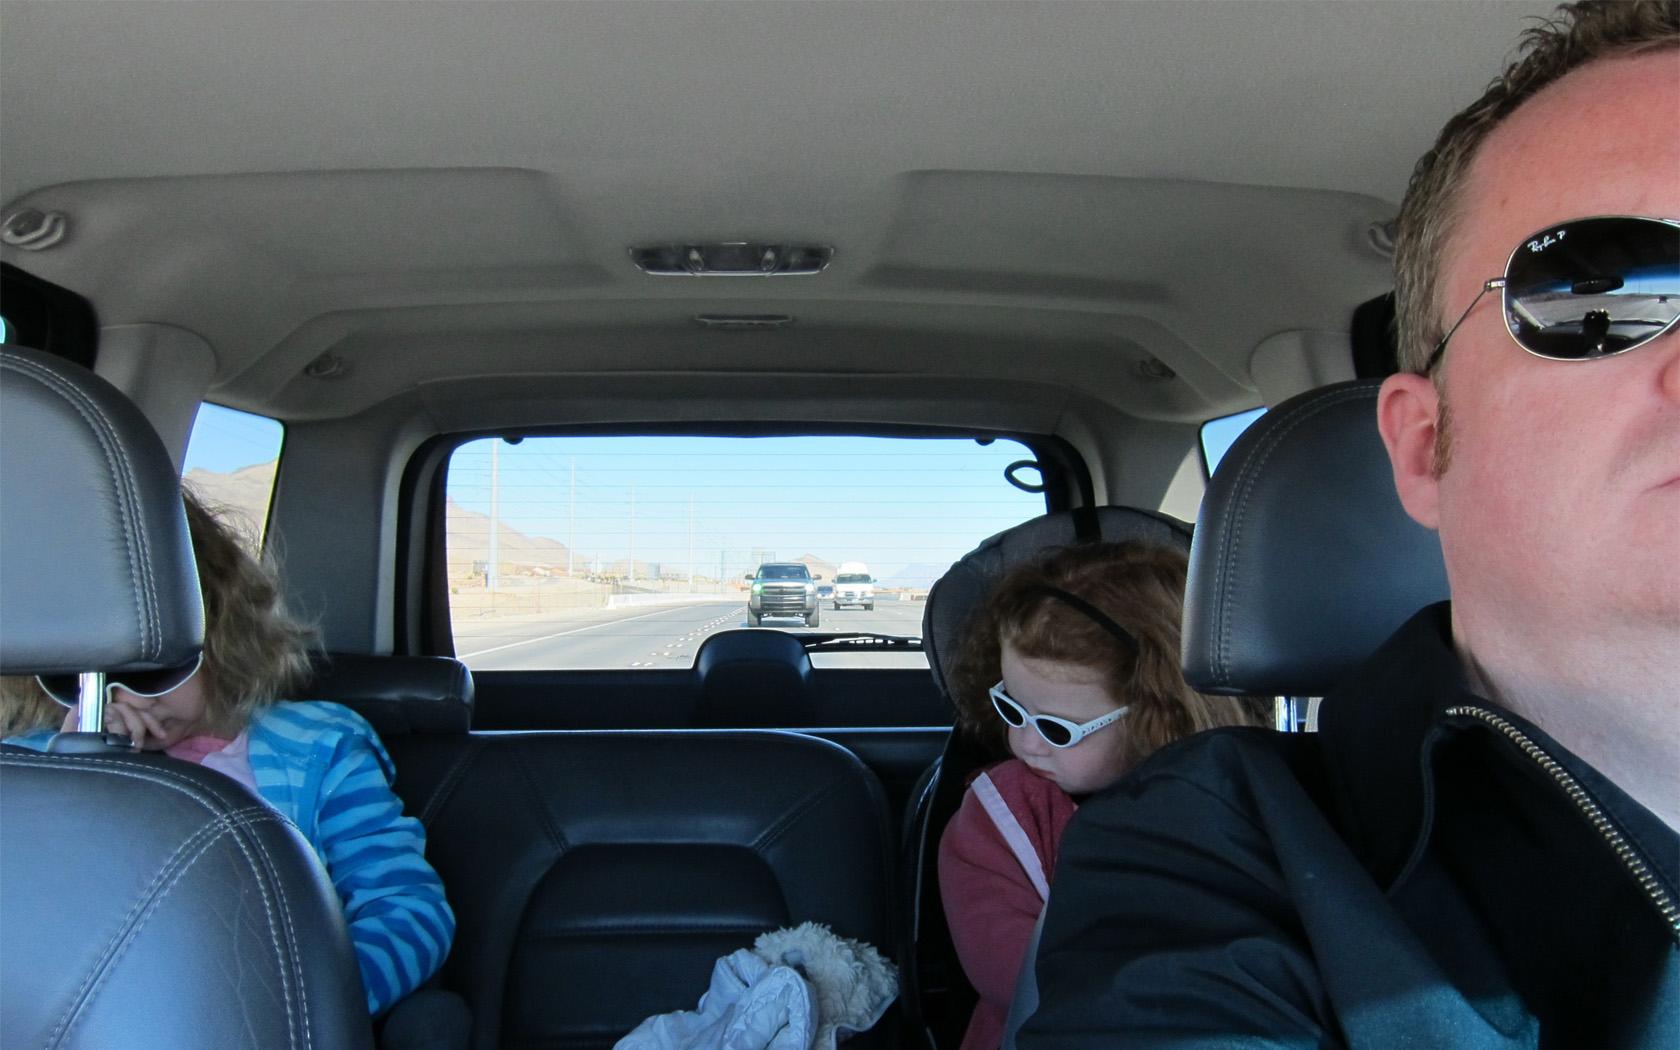 Driving_with_kids_in_desert.jpg